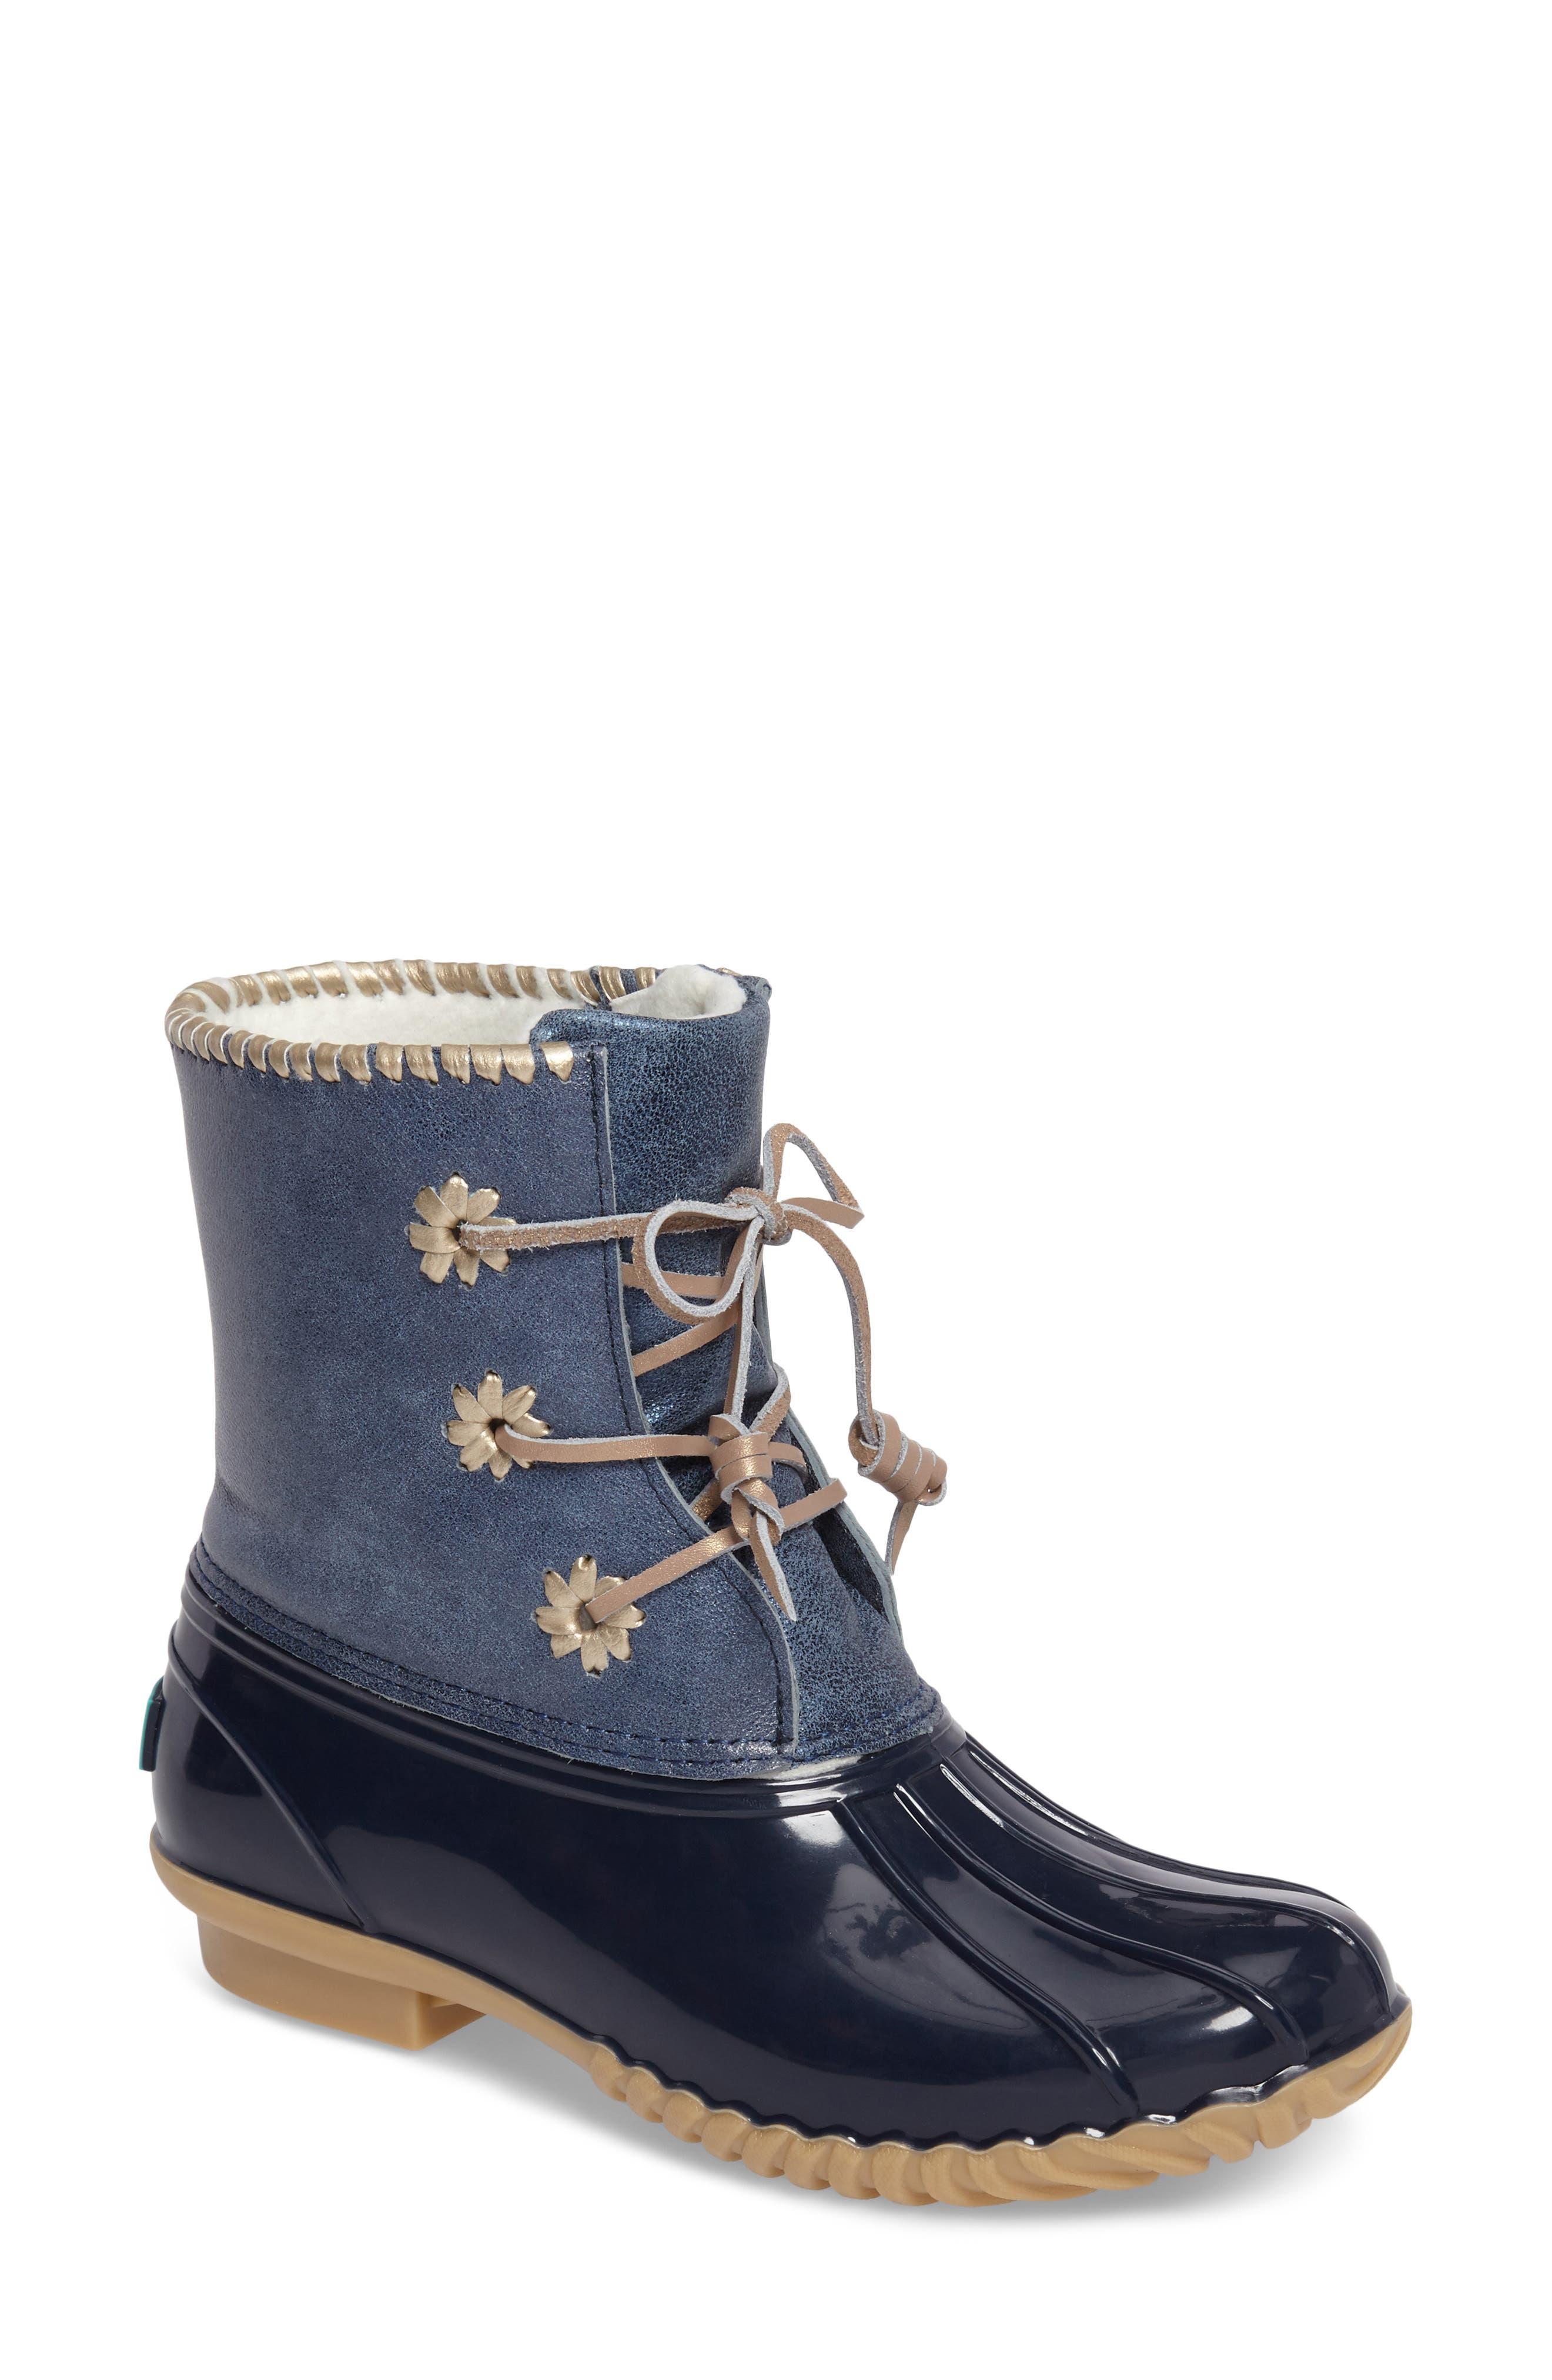 'Chloe' Rain Boot,                             Main thumbnail 6, color,